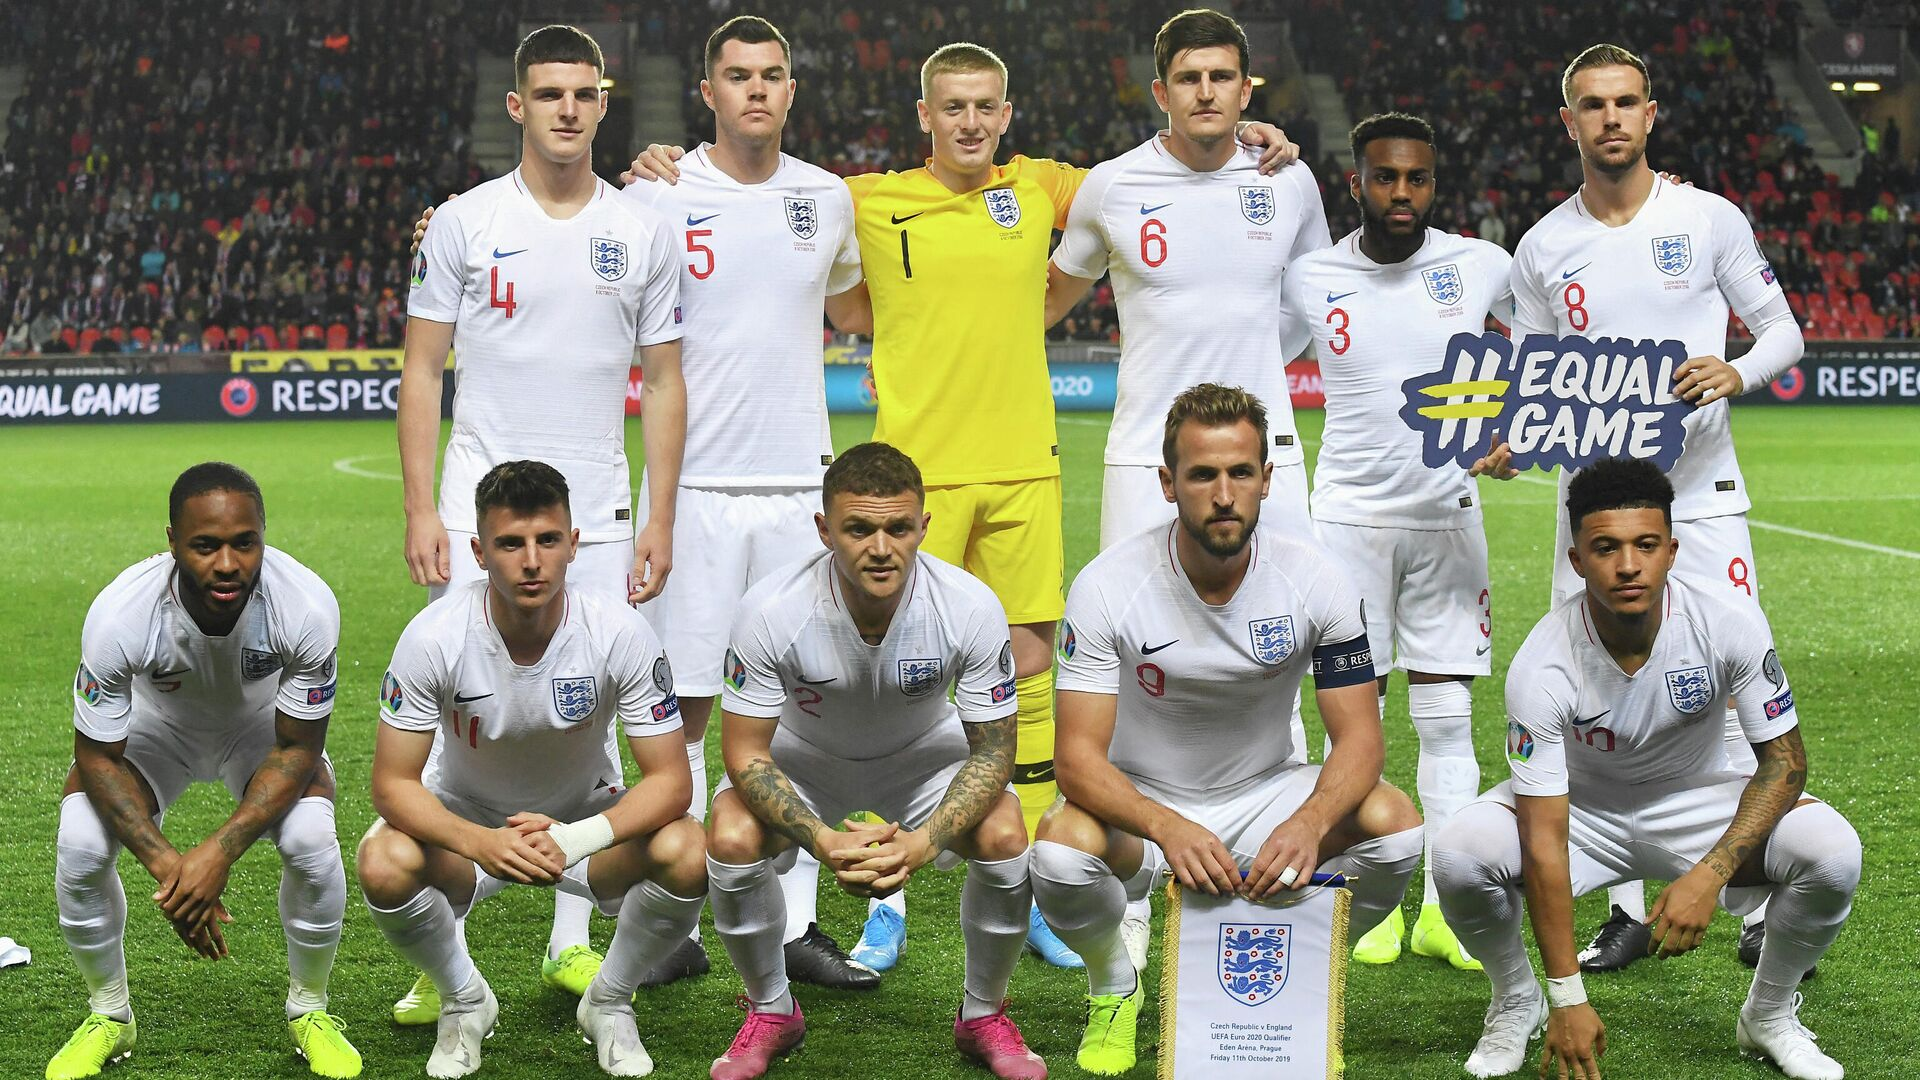 Участники ЕВРО-2020: Англия - РИА Новости, 25.02.2021